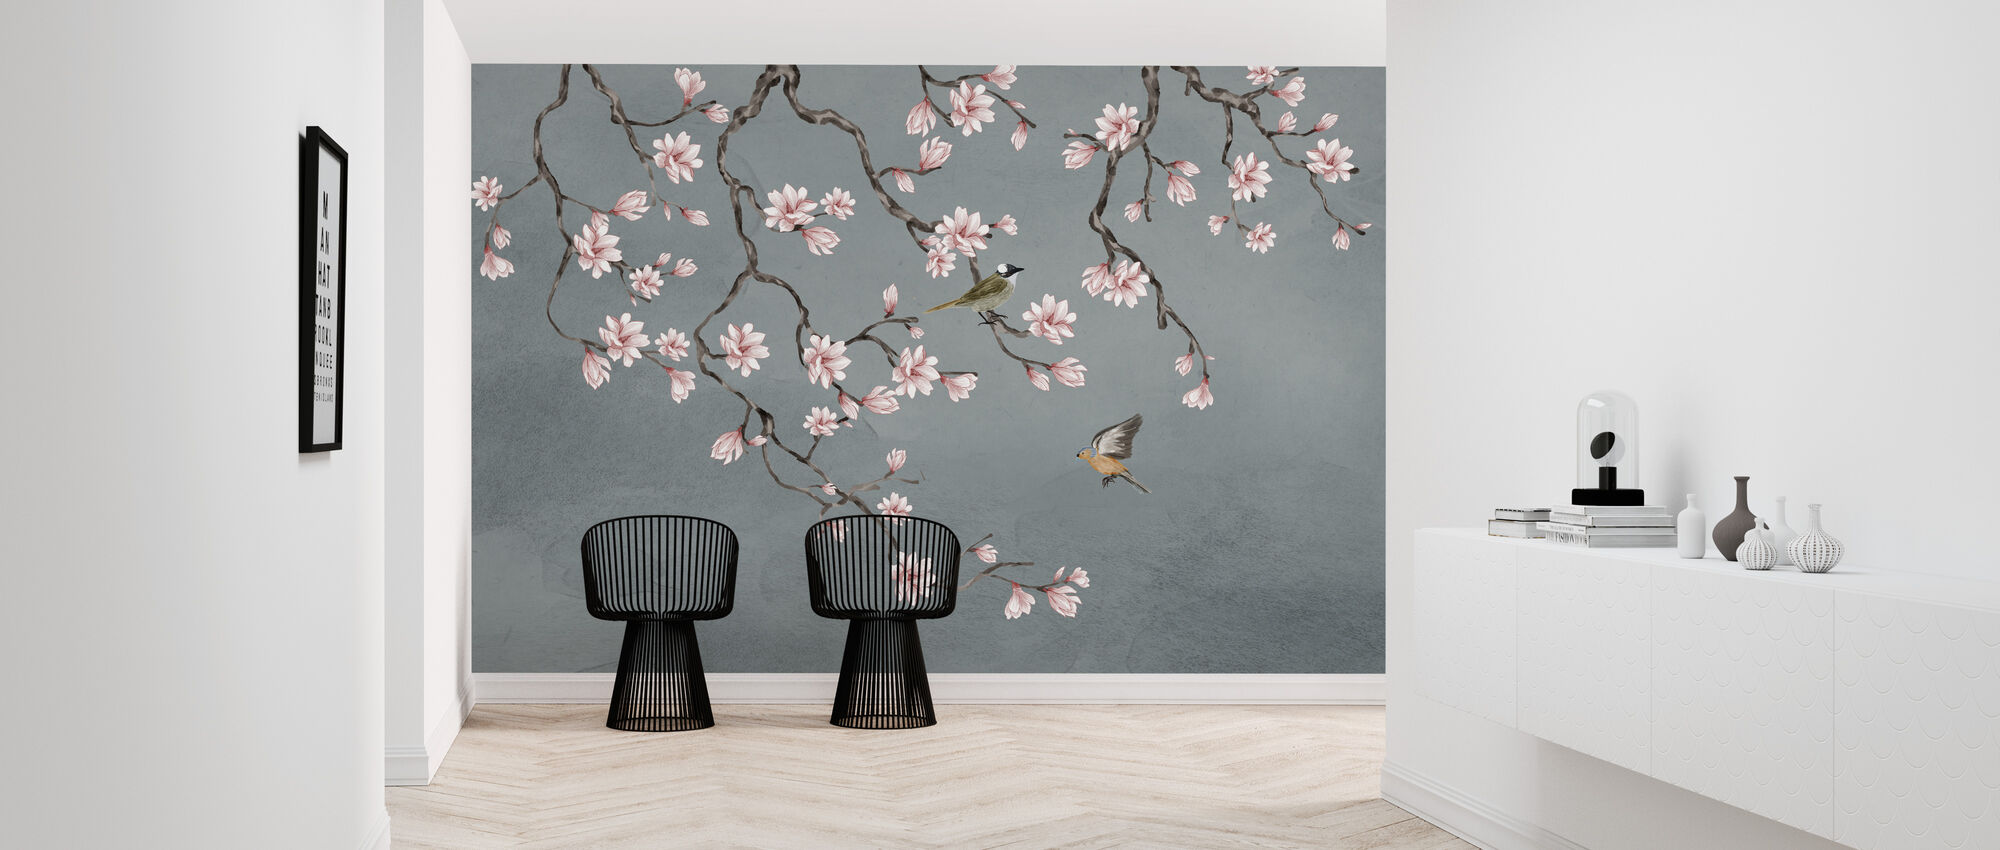 Birds Meeting Place - Wallpaper - Hallway